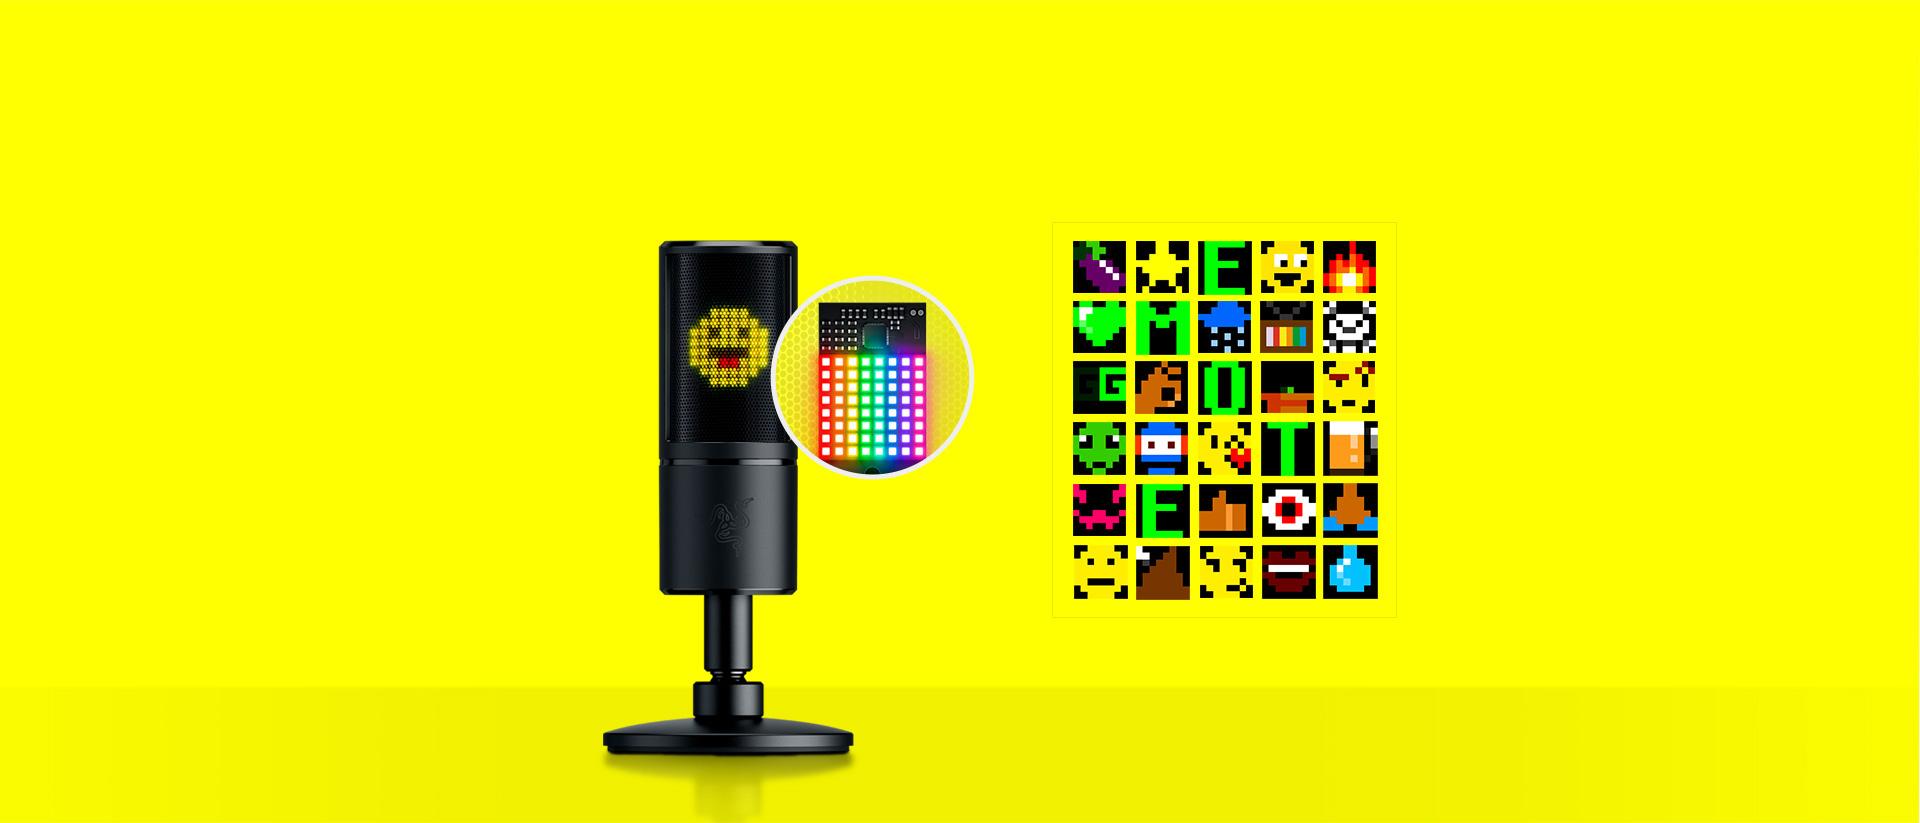 Màn hình led 8-bit của Microphone Razer Seiren Emote with Emotiocons (RZ19-03060100-R3M1)